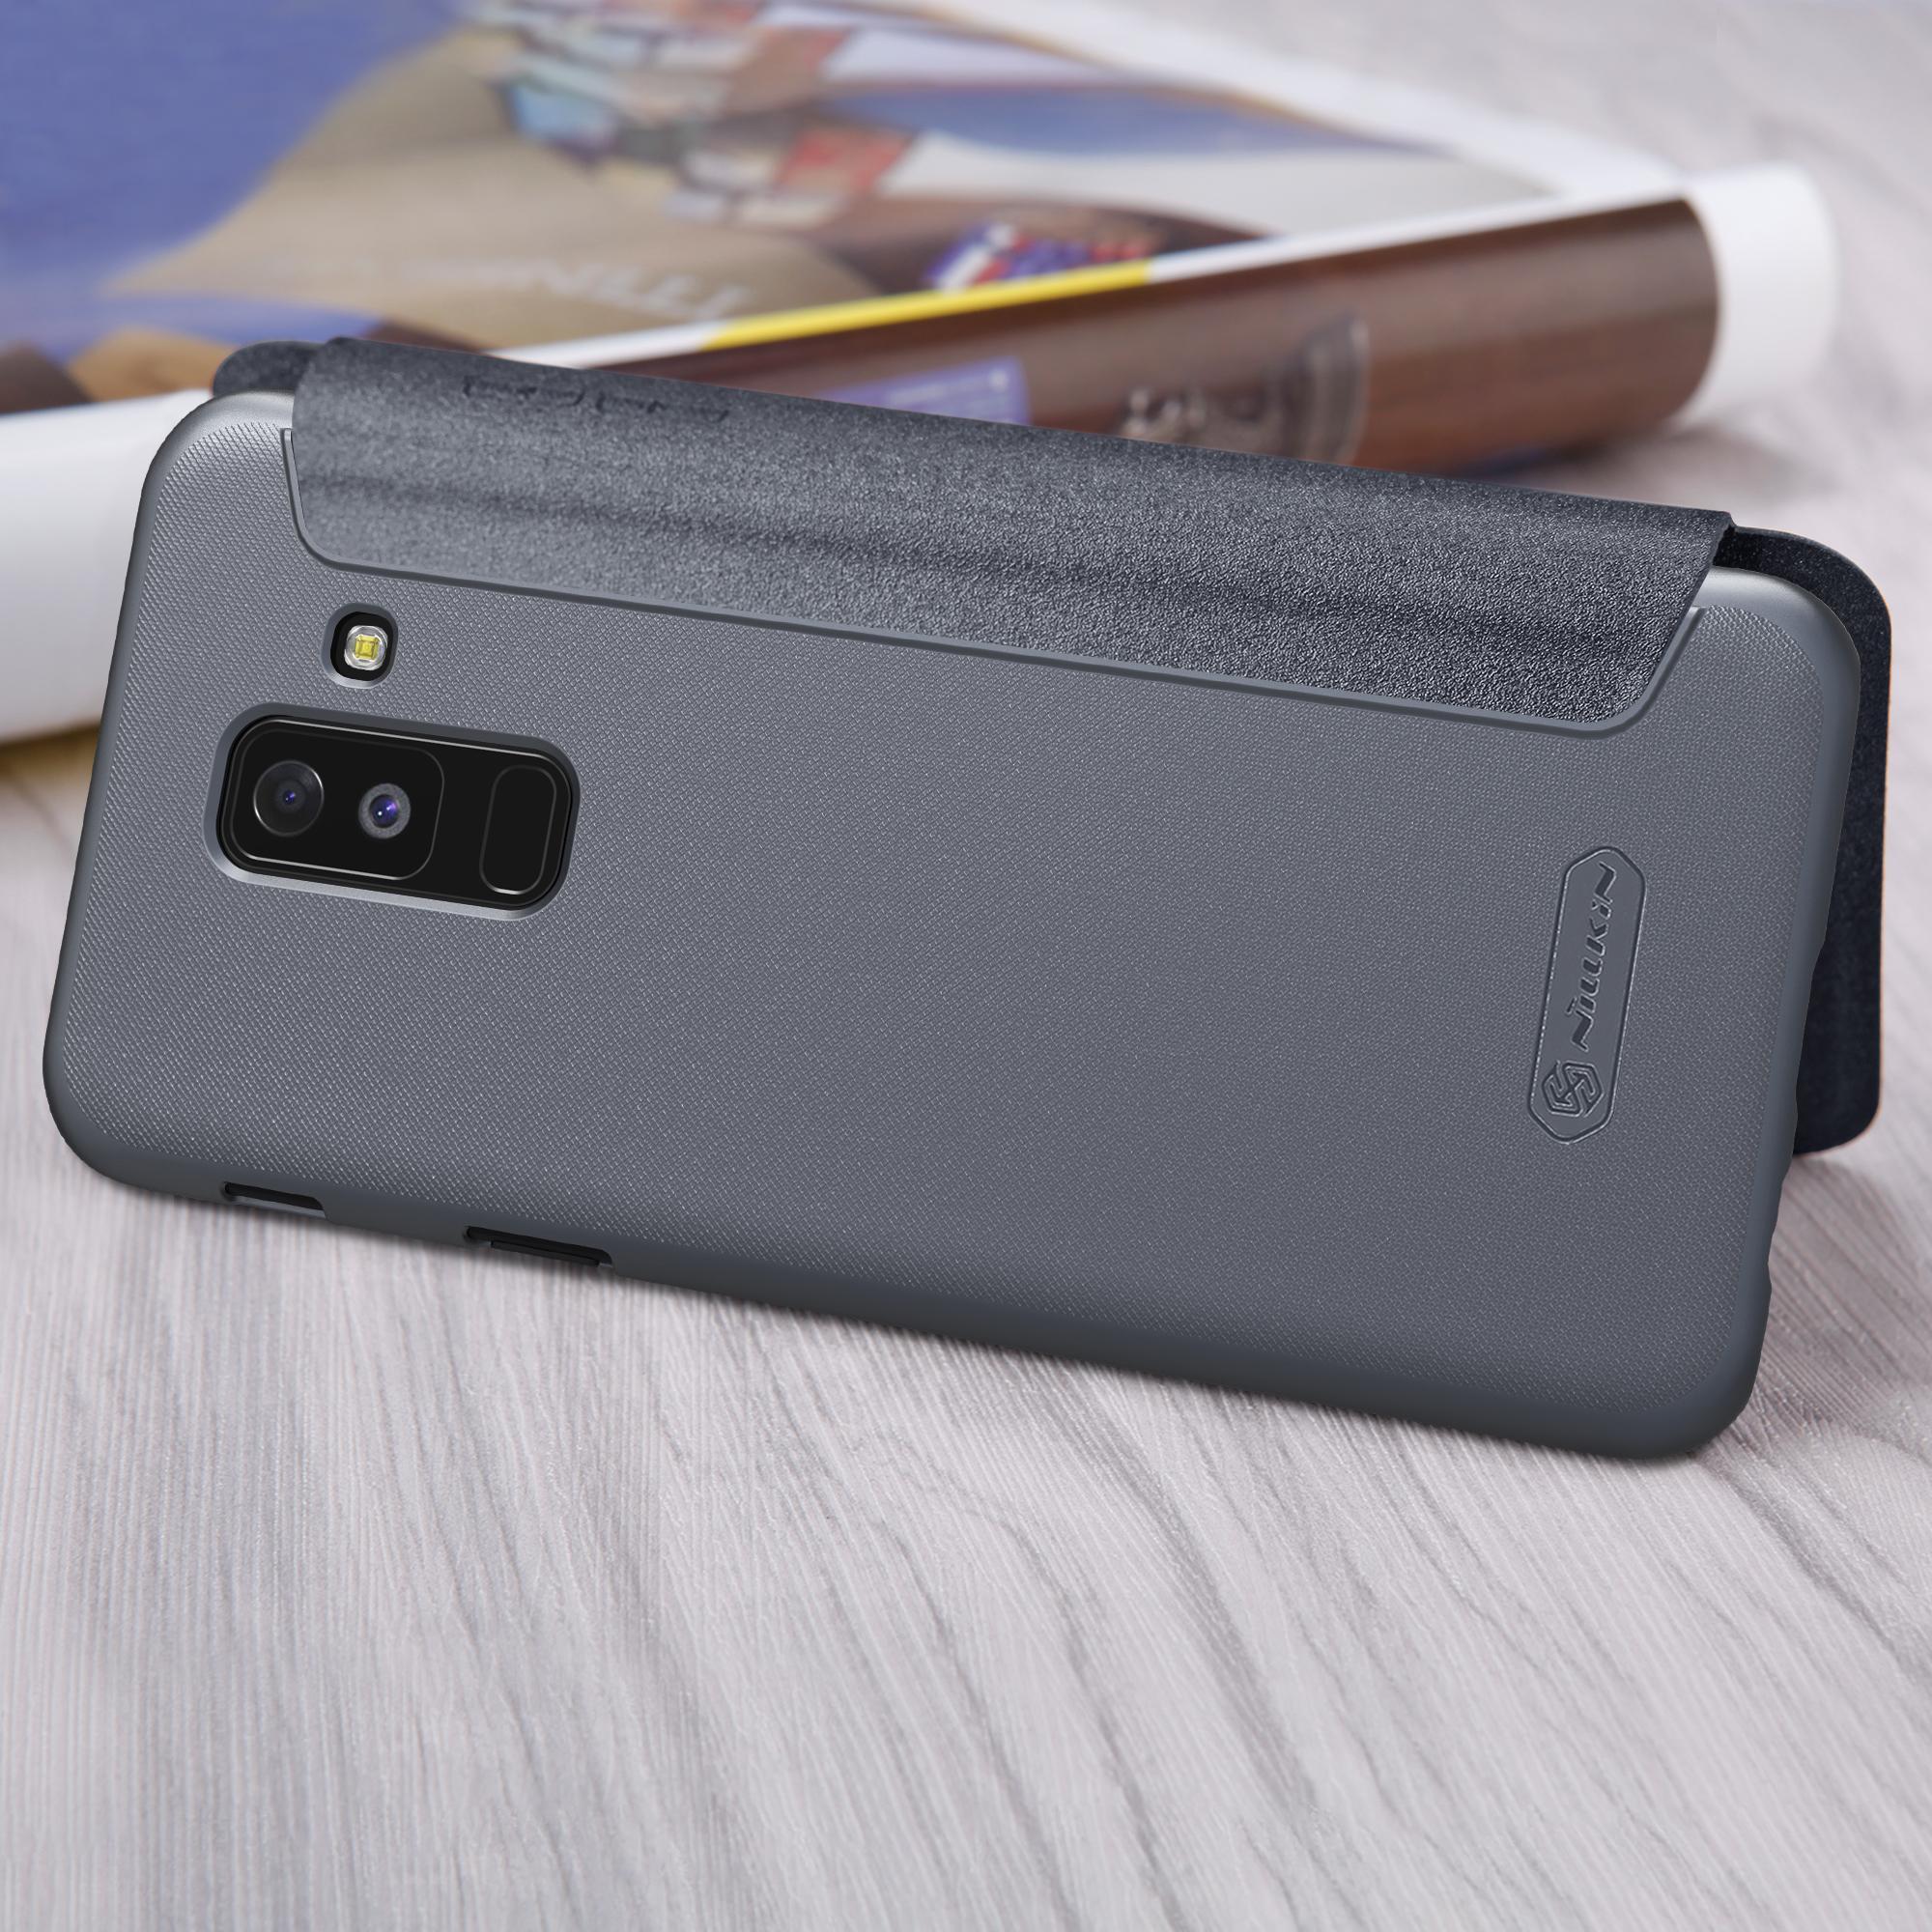 Fitur Samsung Galaxy A6 Plus 2018 Nillkin Sparkle Flip Case Dan